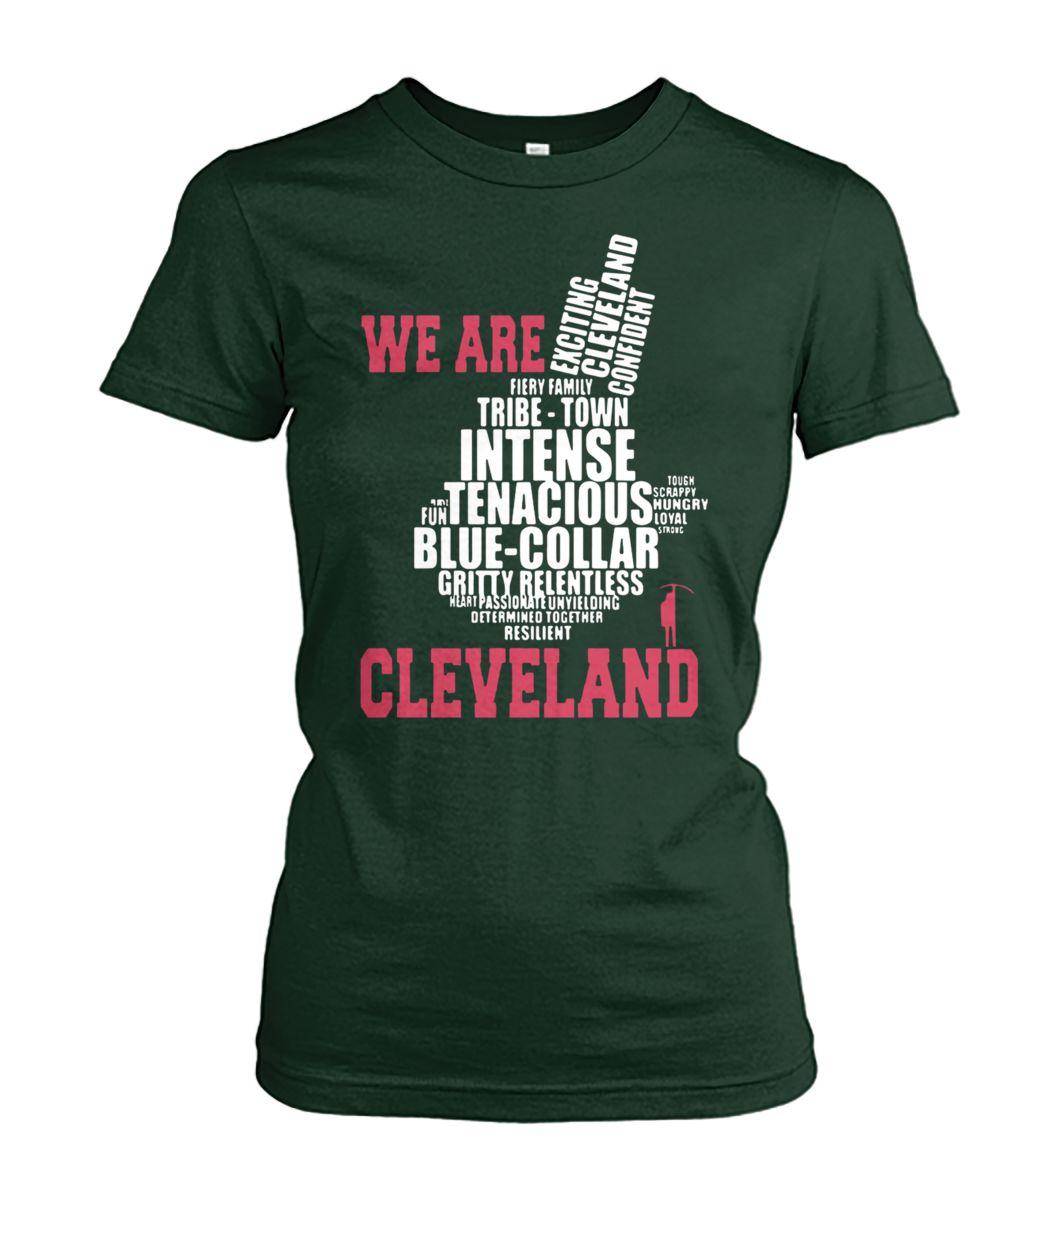 [Hot version] MLB chief wahoo logo trevor bauer we are cleveland shirt